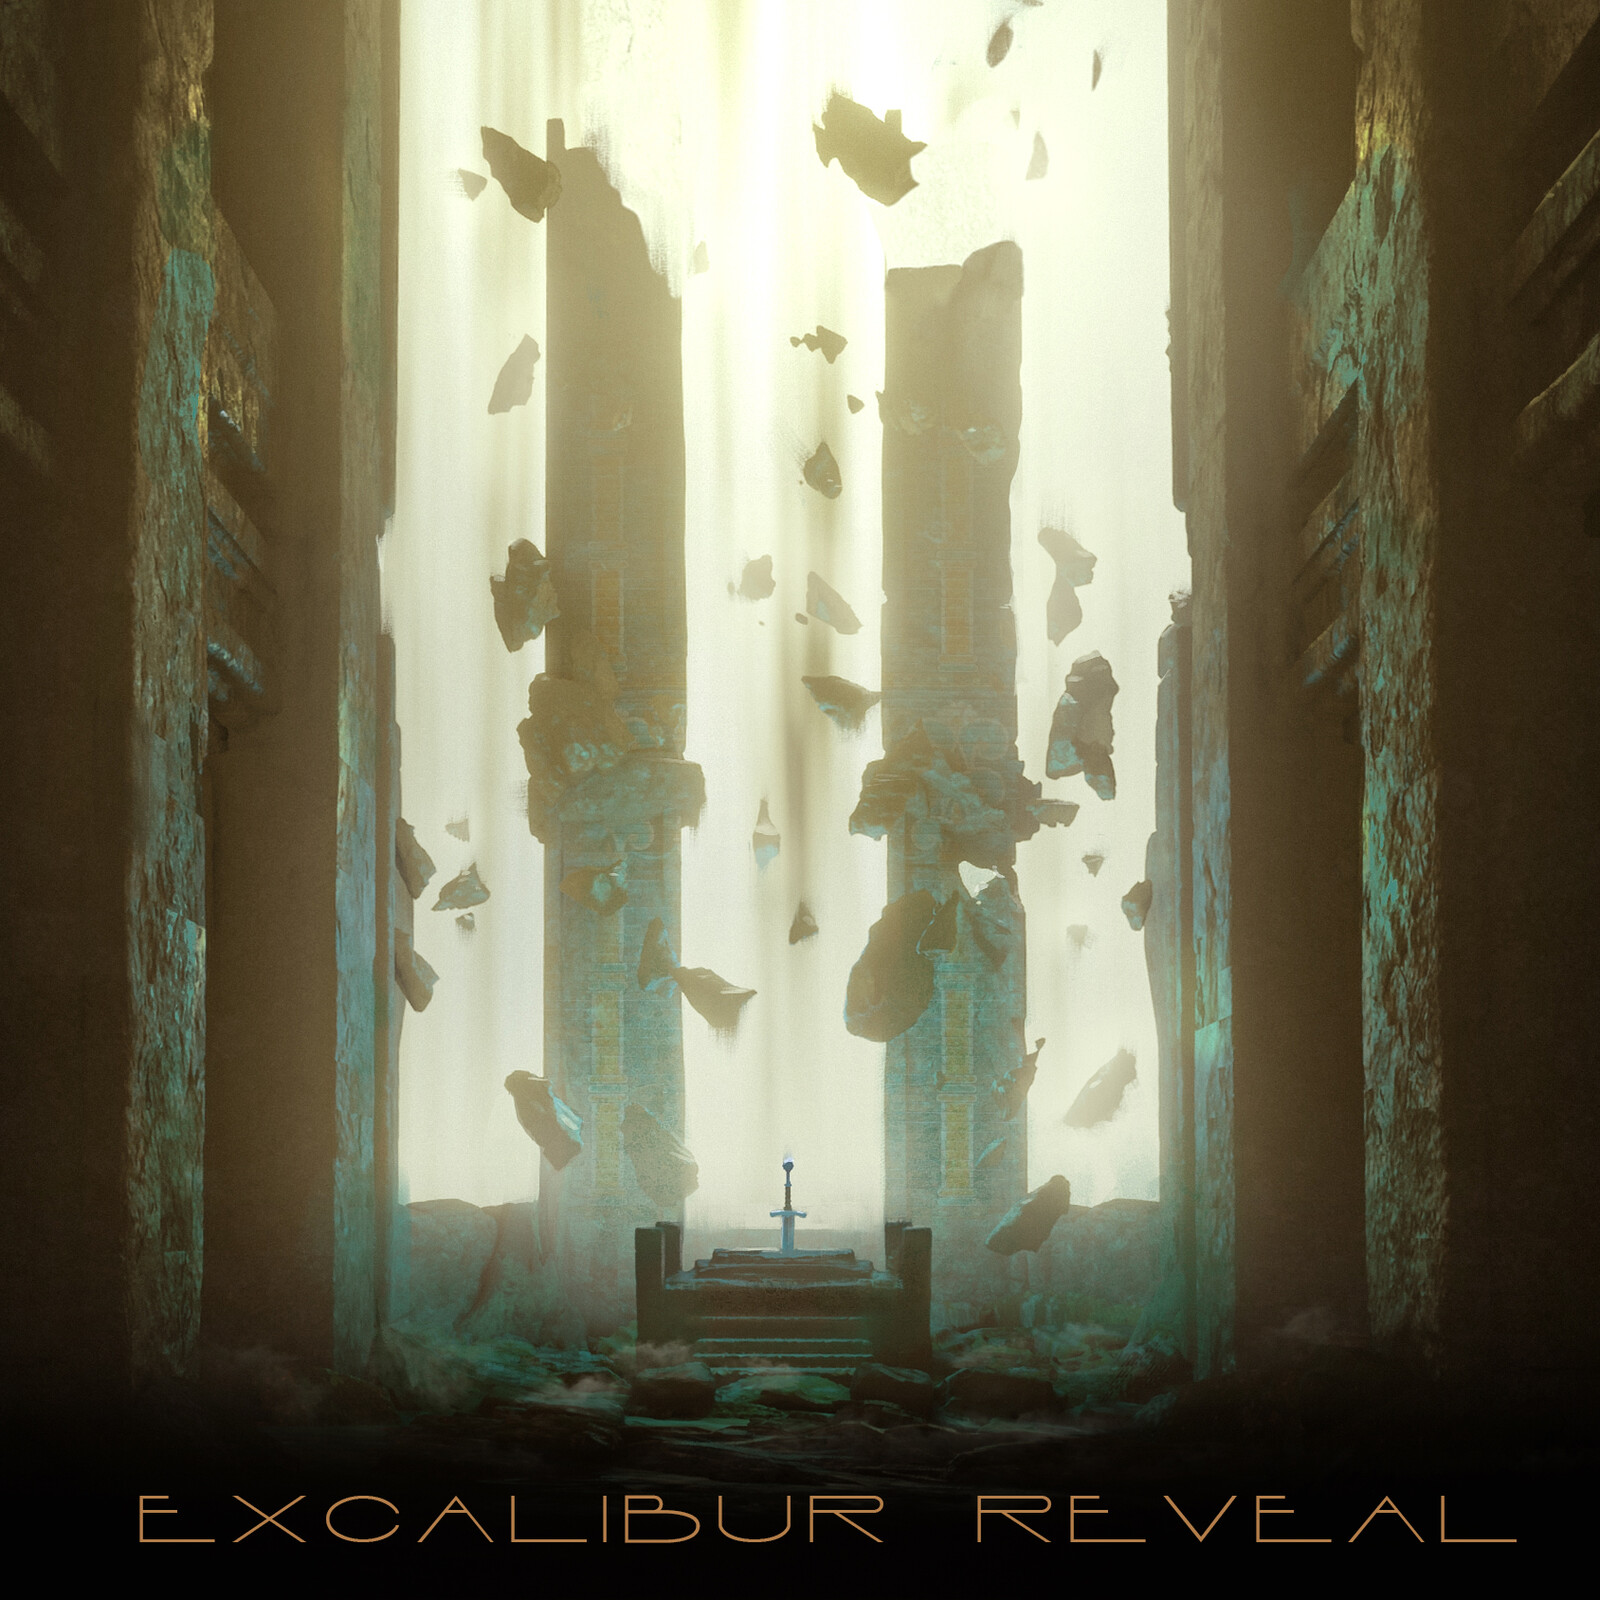 Excalibur reveal moment